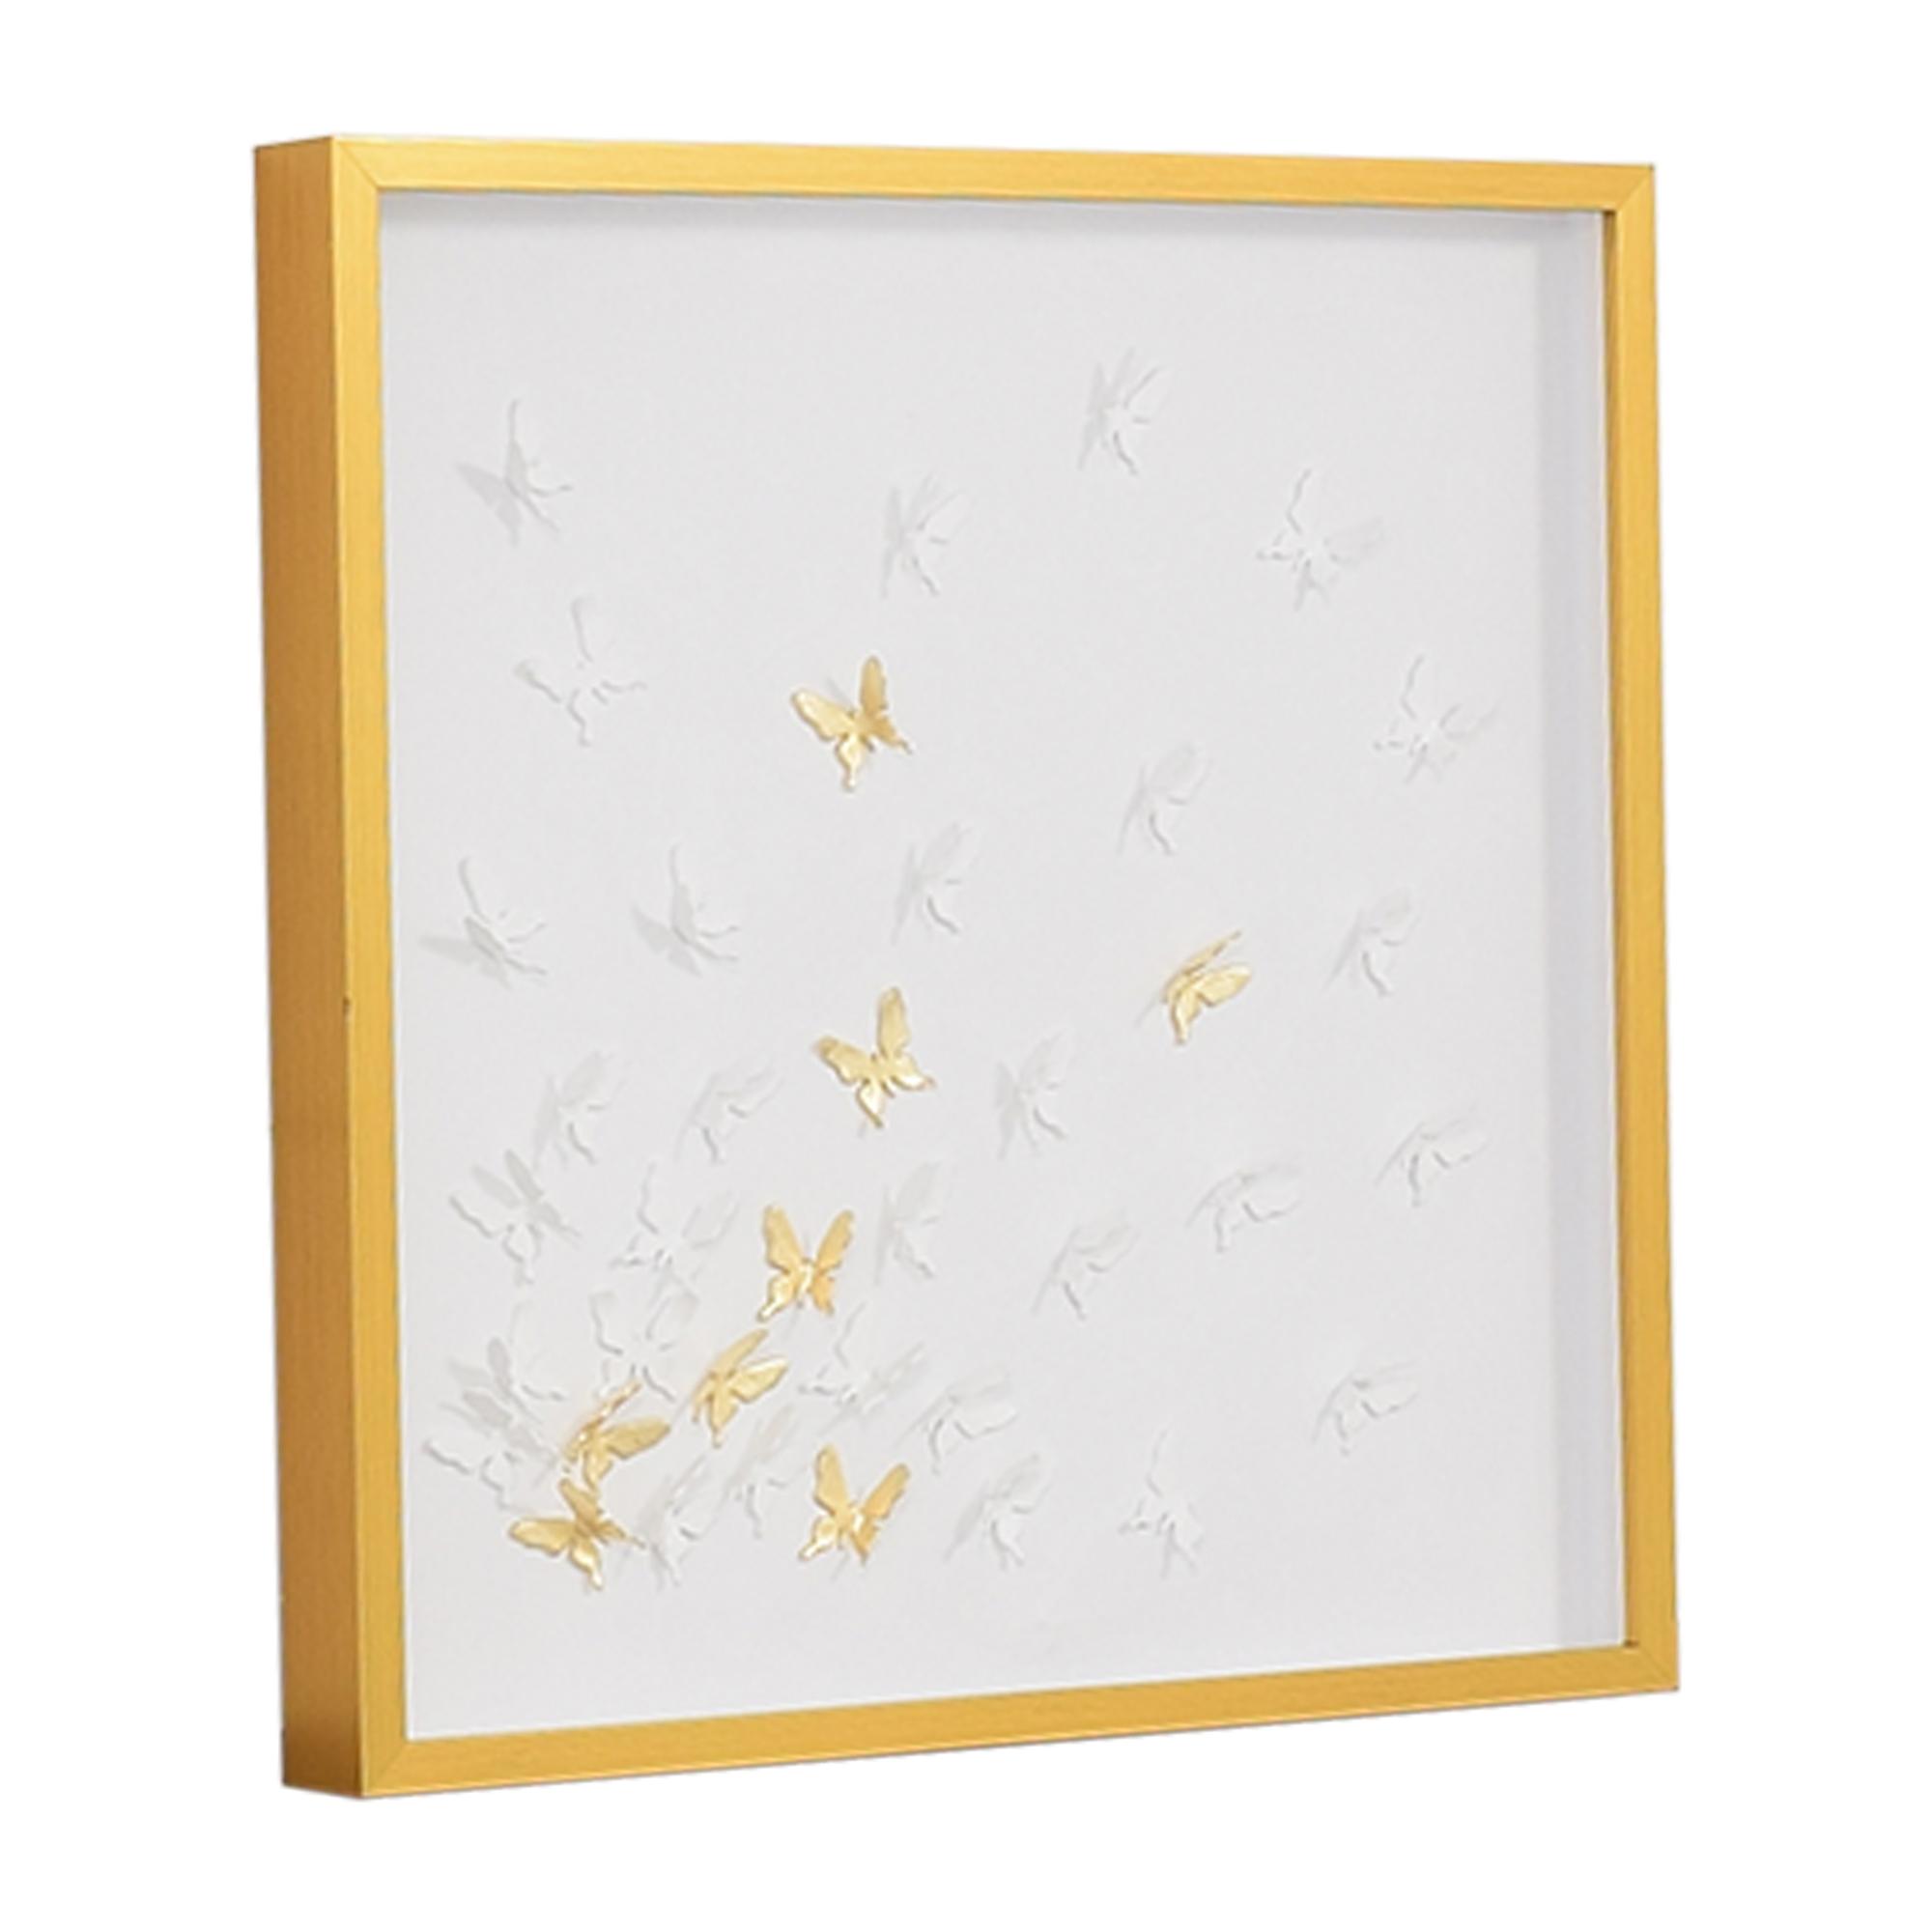 Modsy Framed Golden Butterfly III Wall Art Modsy